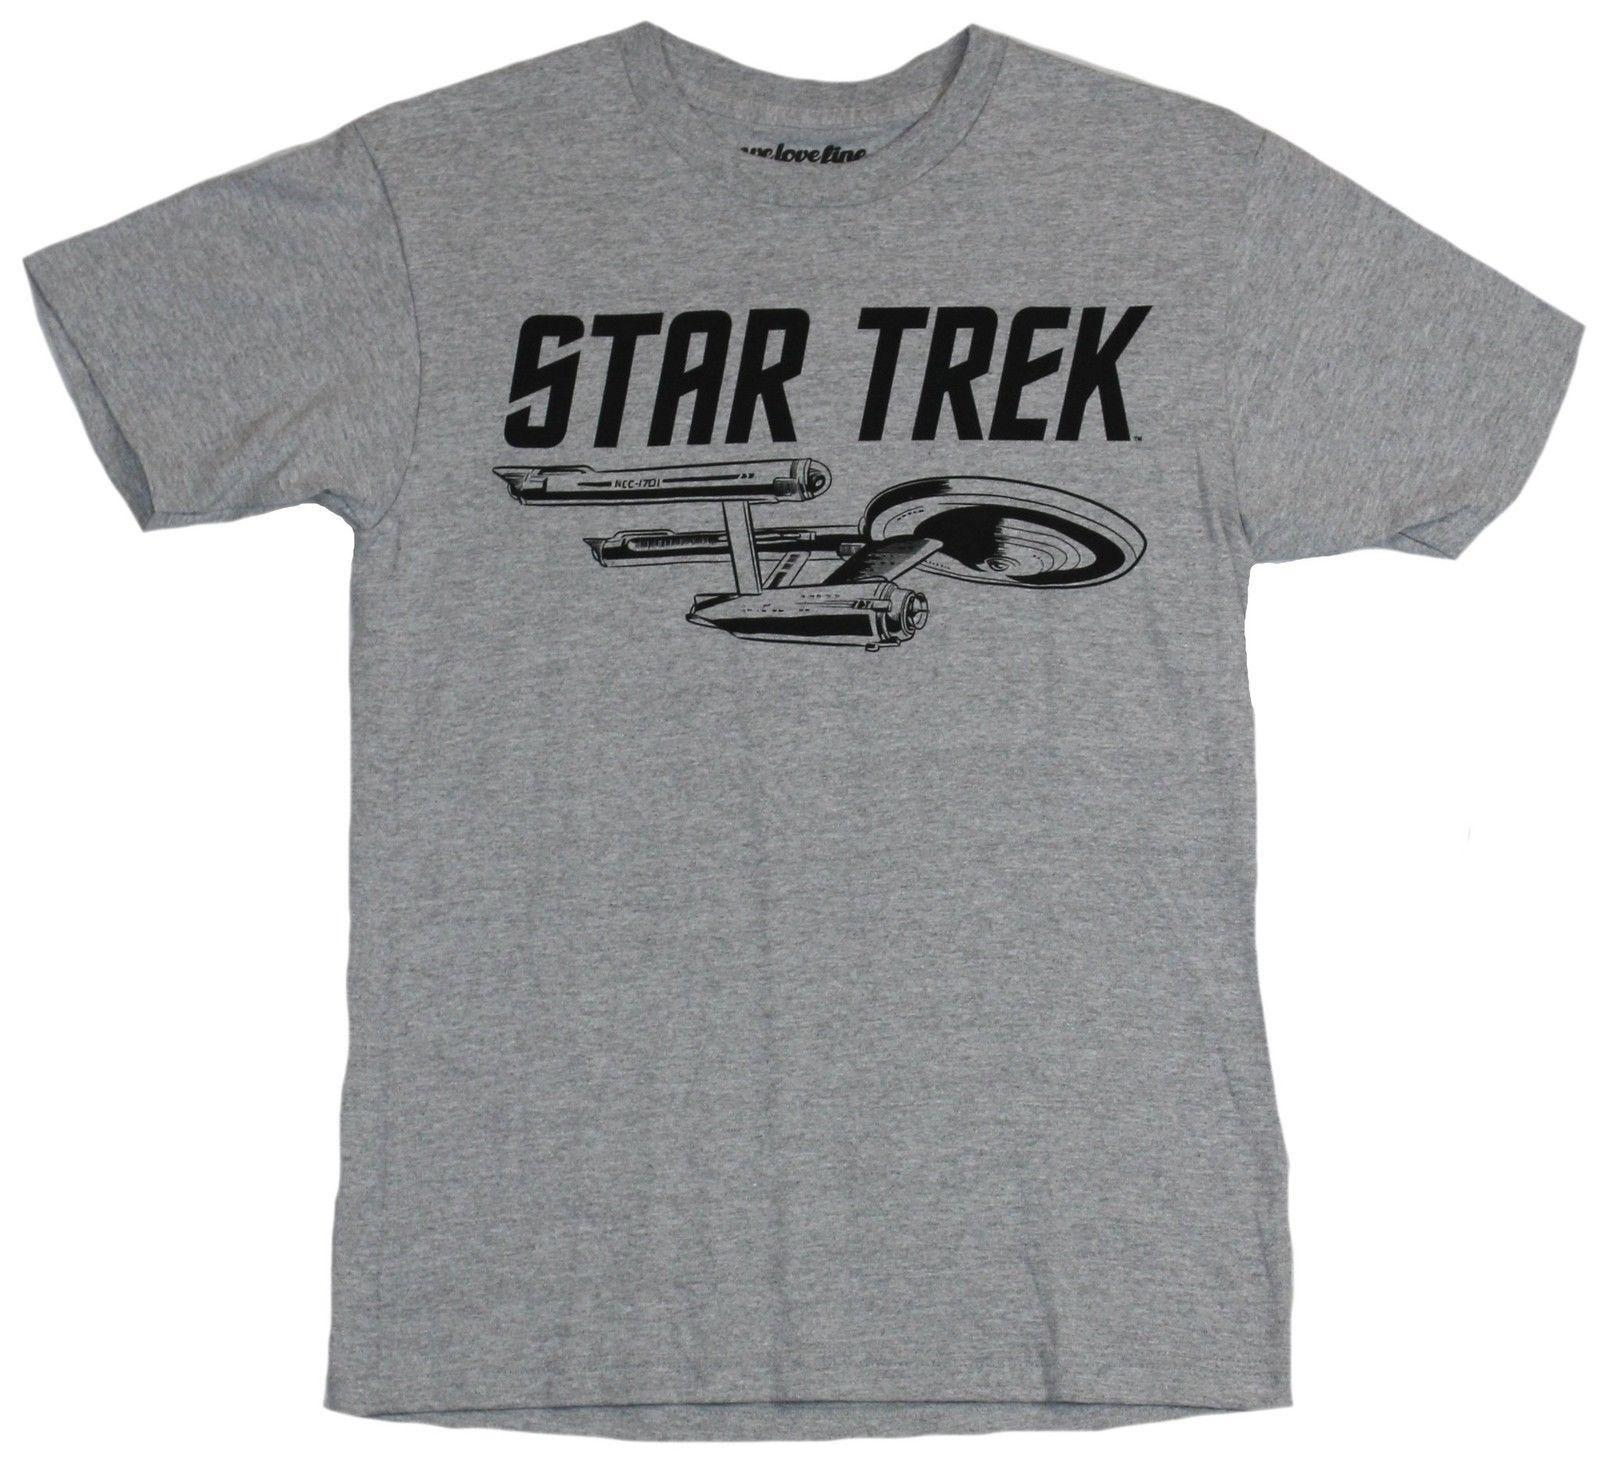 6d3ba3c6 Star Trek Mens T Shirt Enterprise Under Black Words Image Logo Men ...